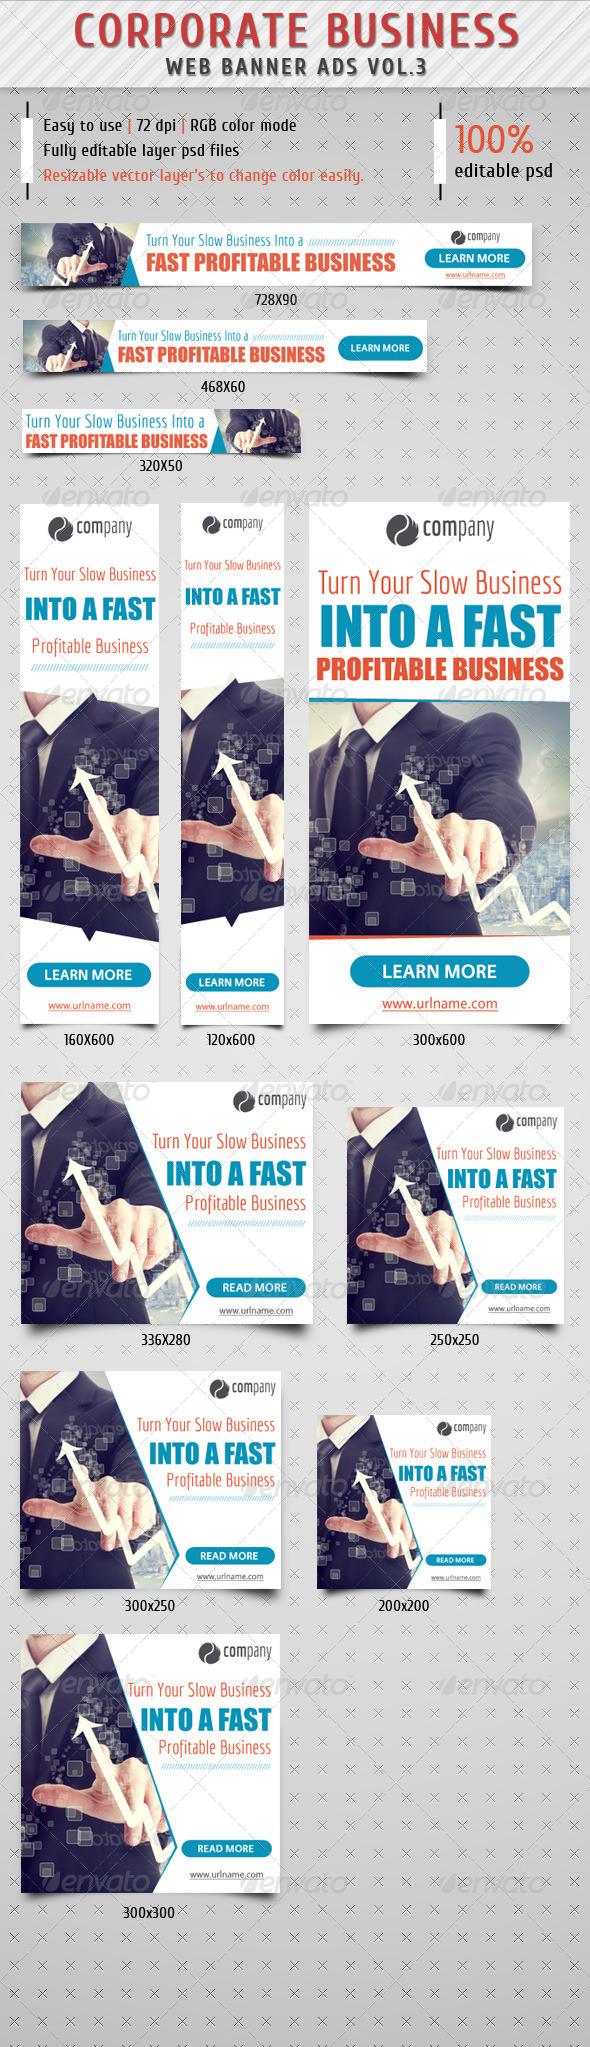 GraphicRiver Corporate Web Banner Ads Vol.3 8617285